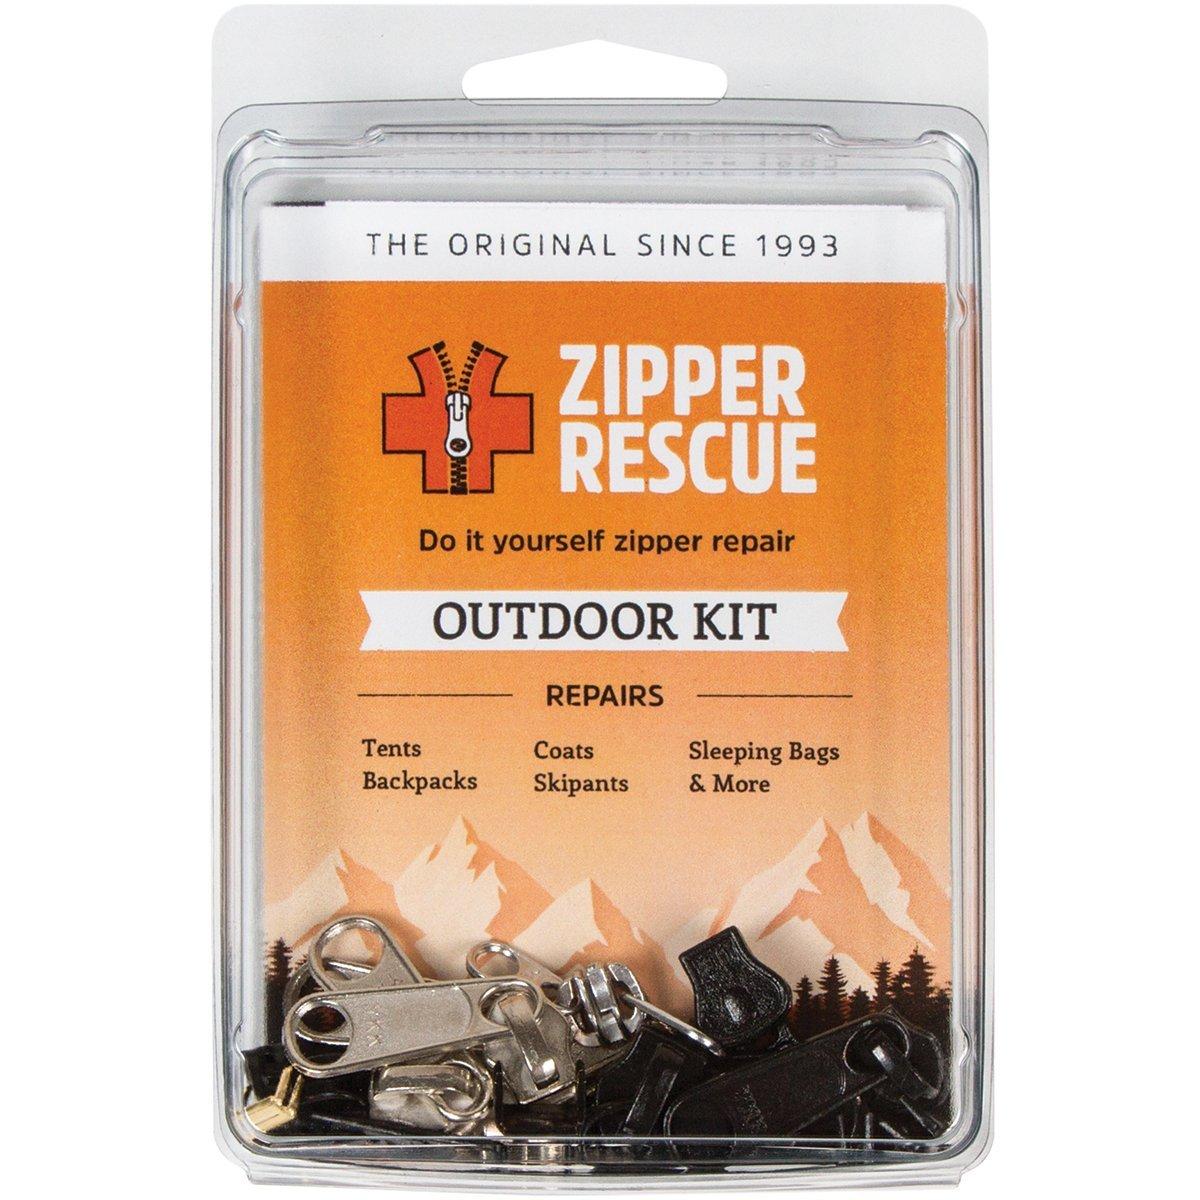 Tent Zipper Replacement & Outdoor Gear Repair